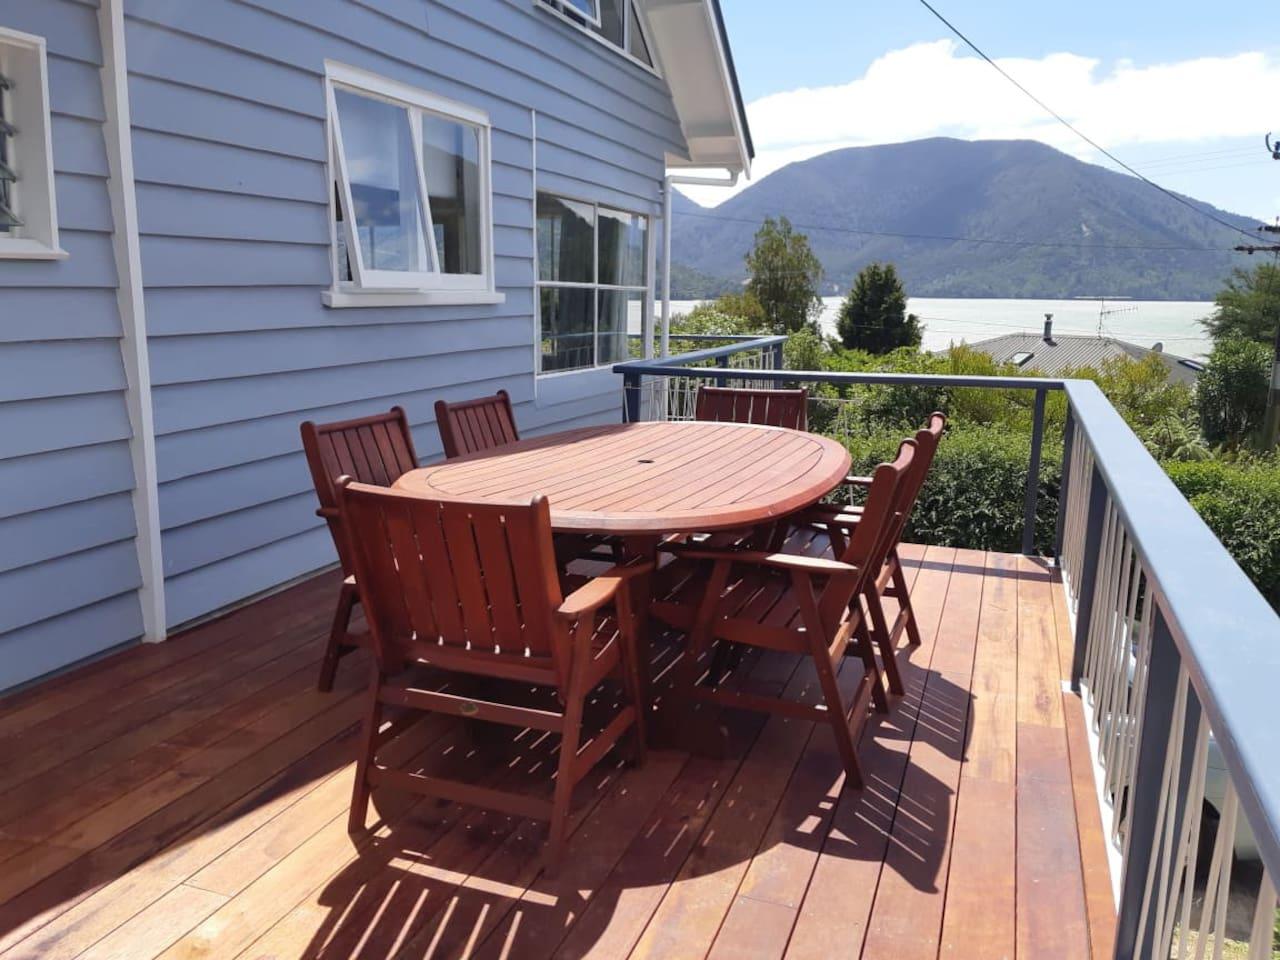 Enjoy breakfast on the deck overlooking the bay.